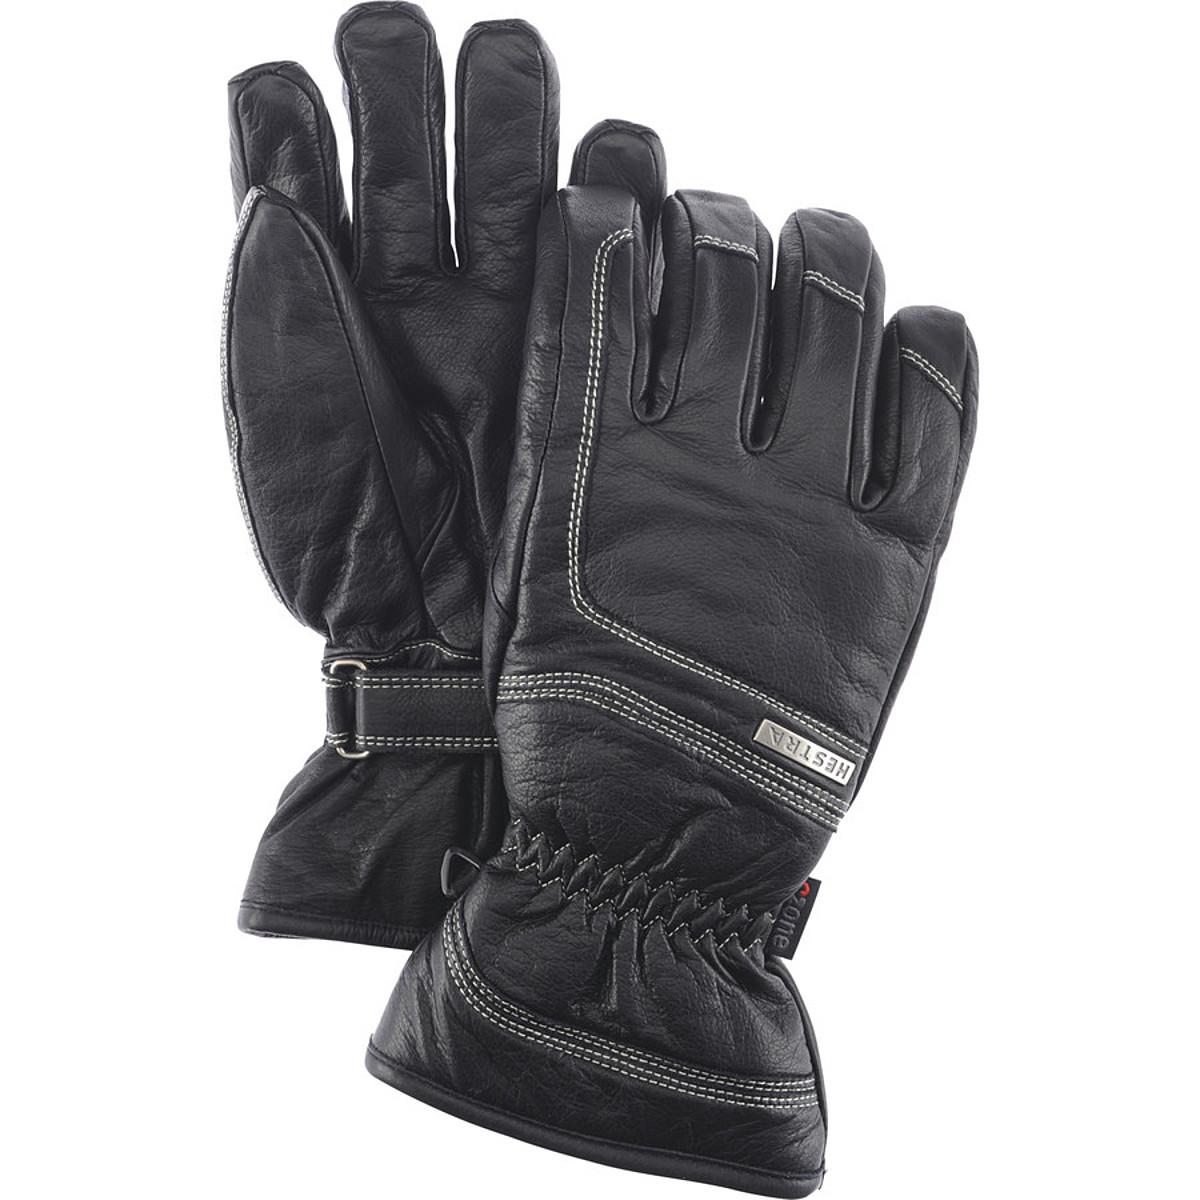 Insulated Glove Mitten Reviews Trailspace Com